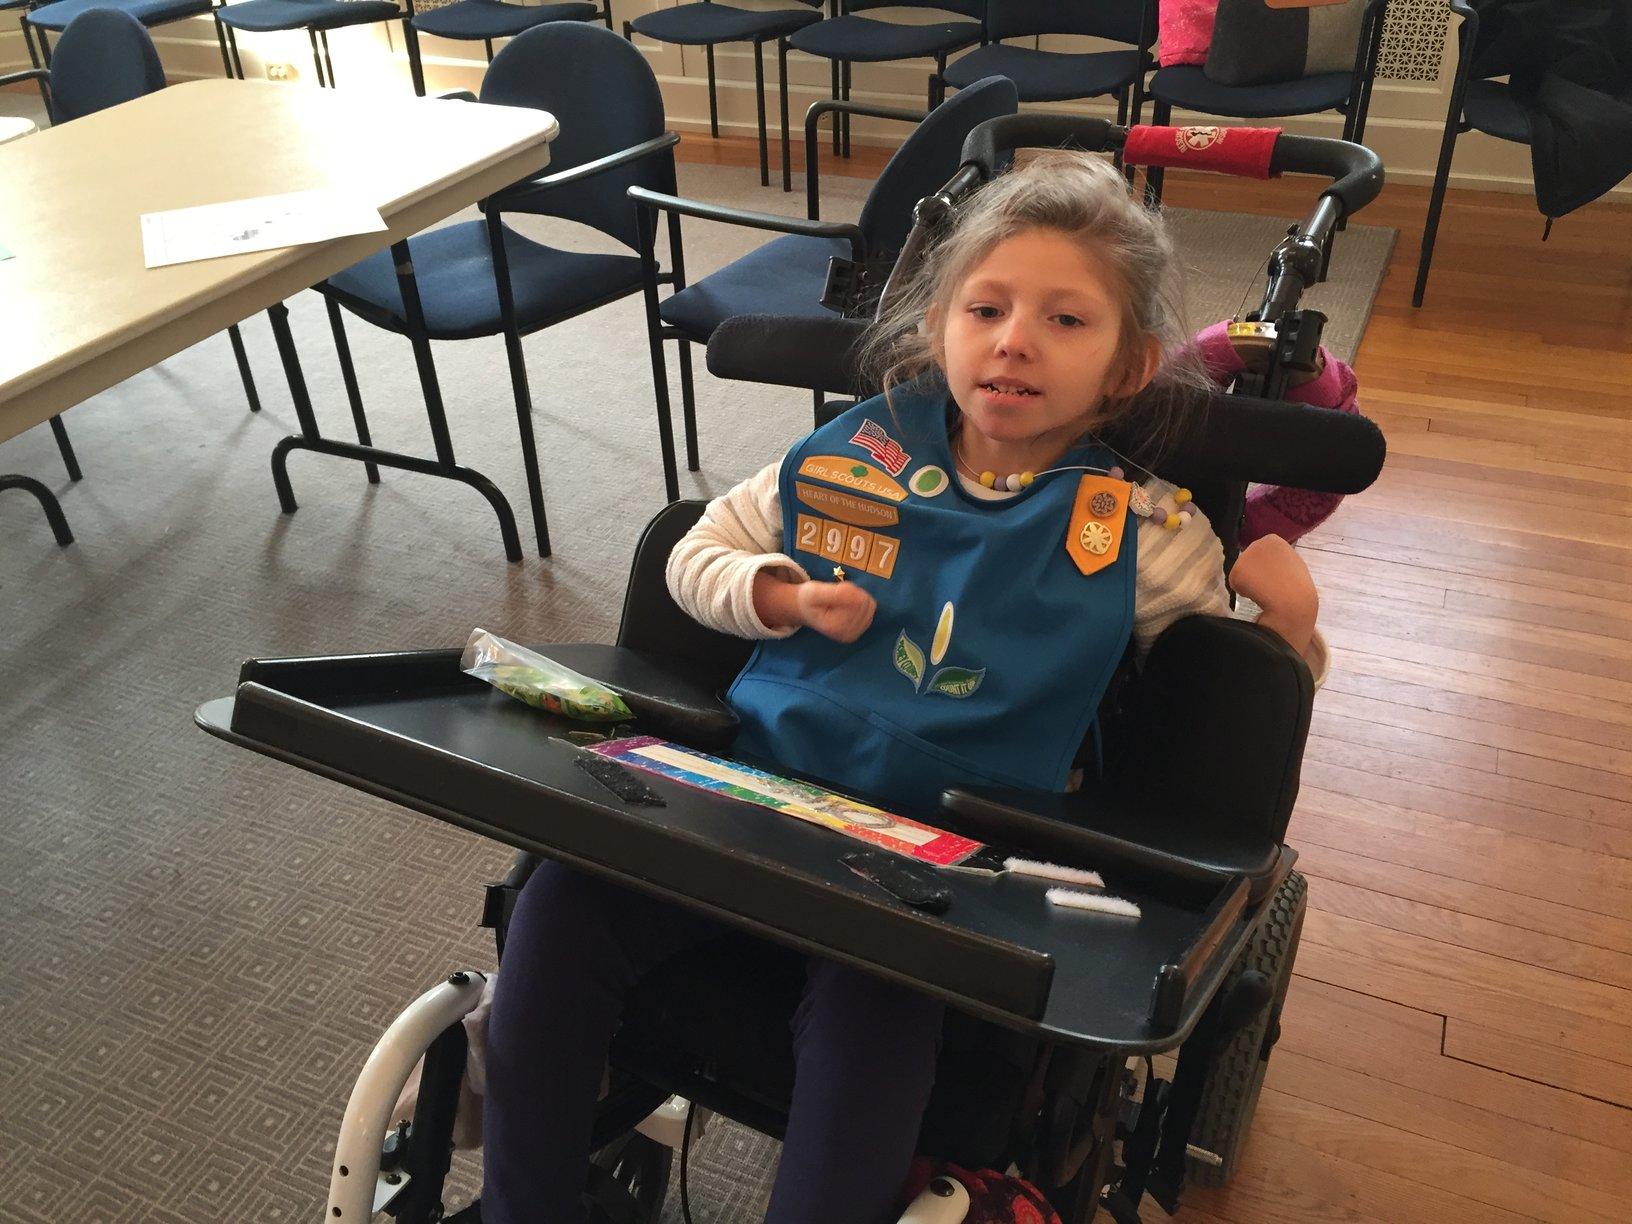 rsz_maria_fareri_childrens_hospital_vanderwoude_olivia3(1).jpg